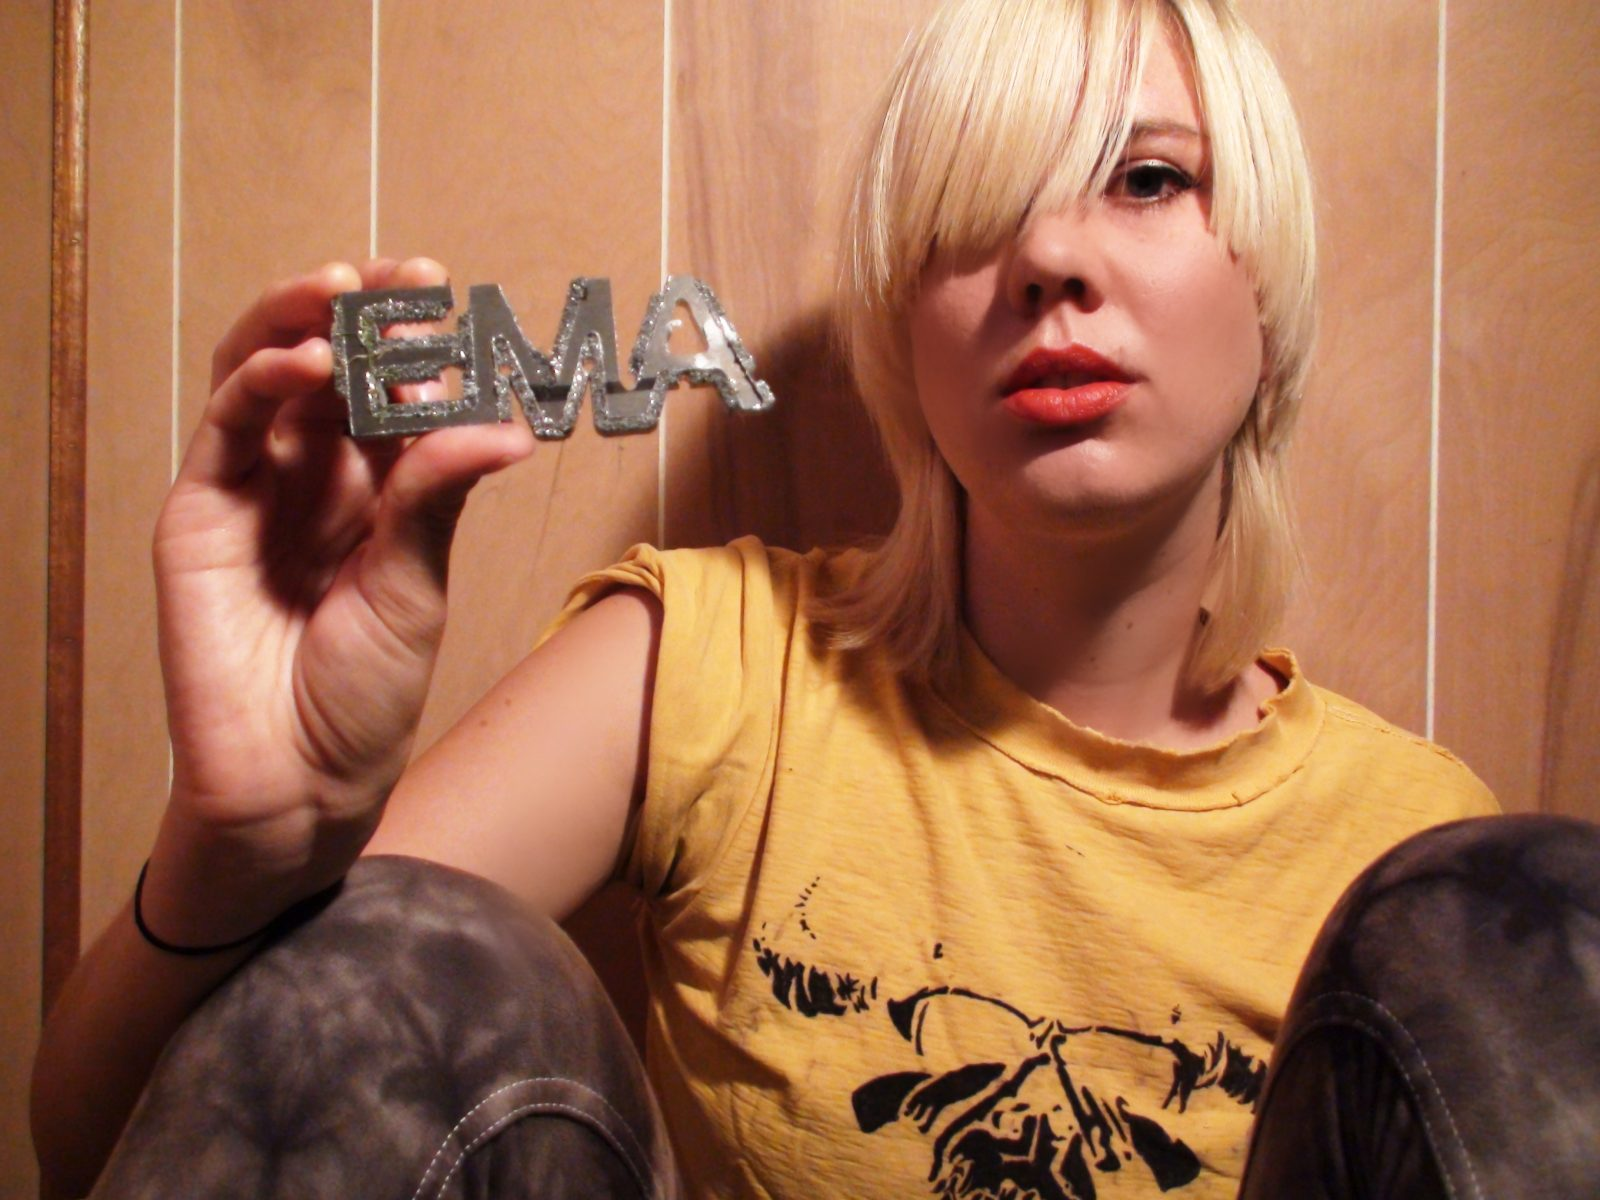 last year's jams: so blonde;